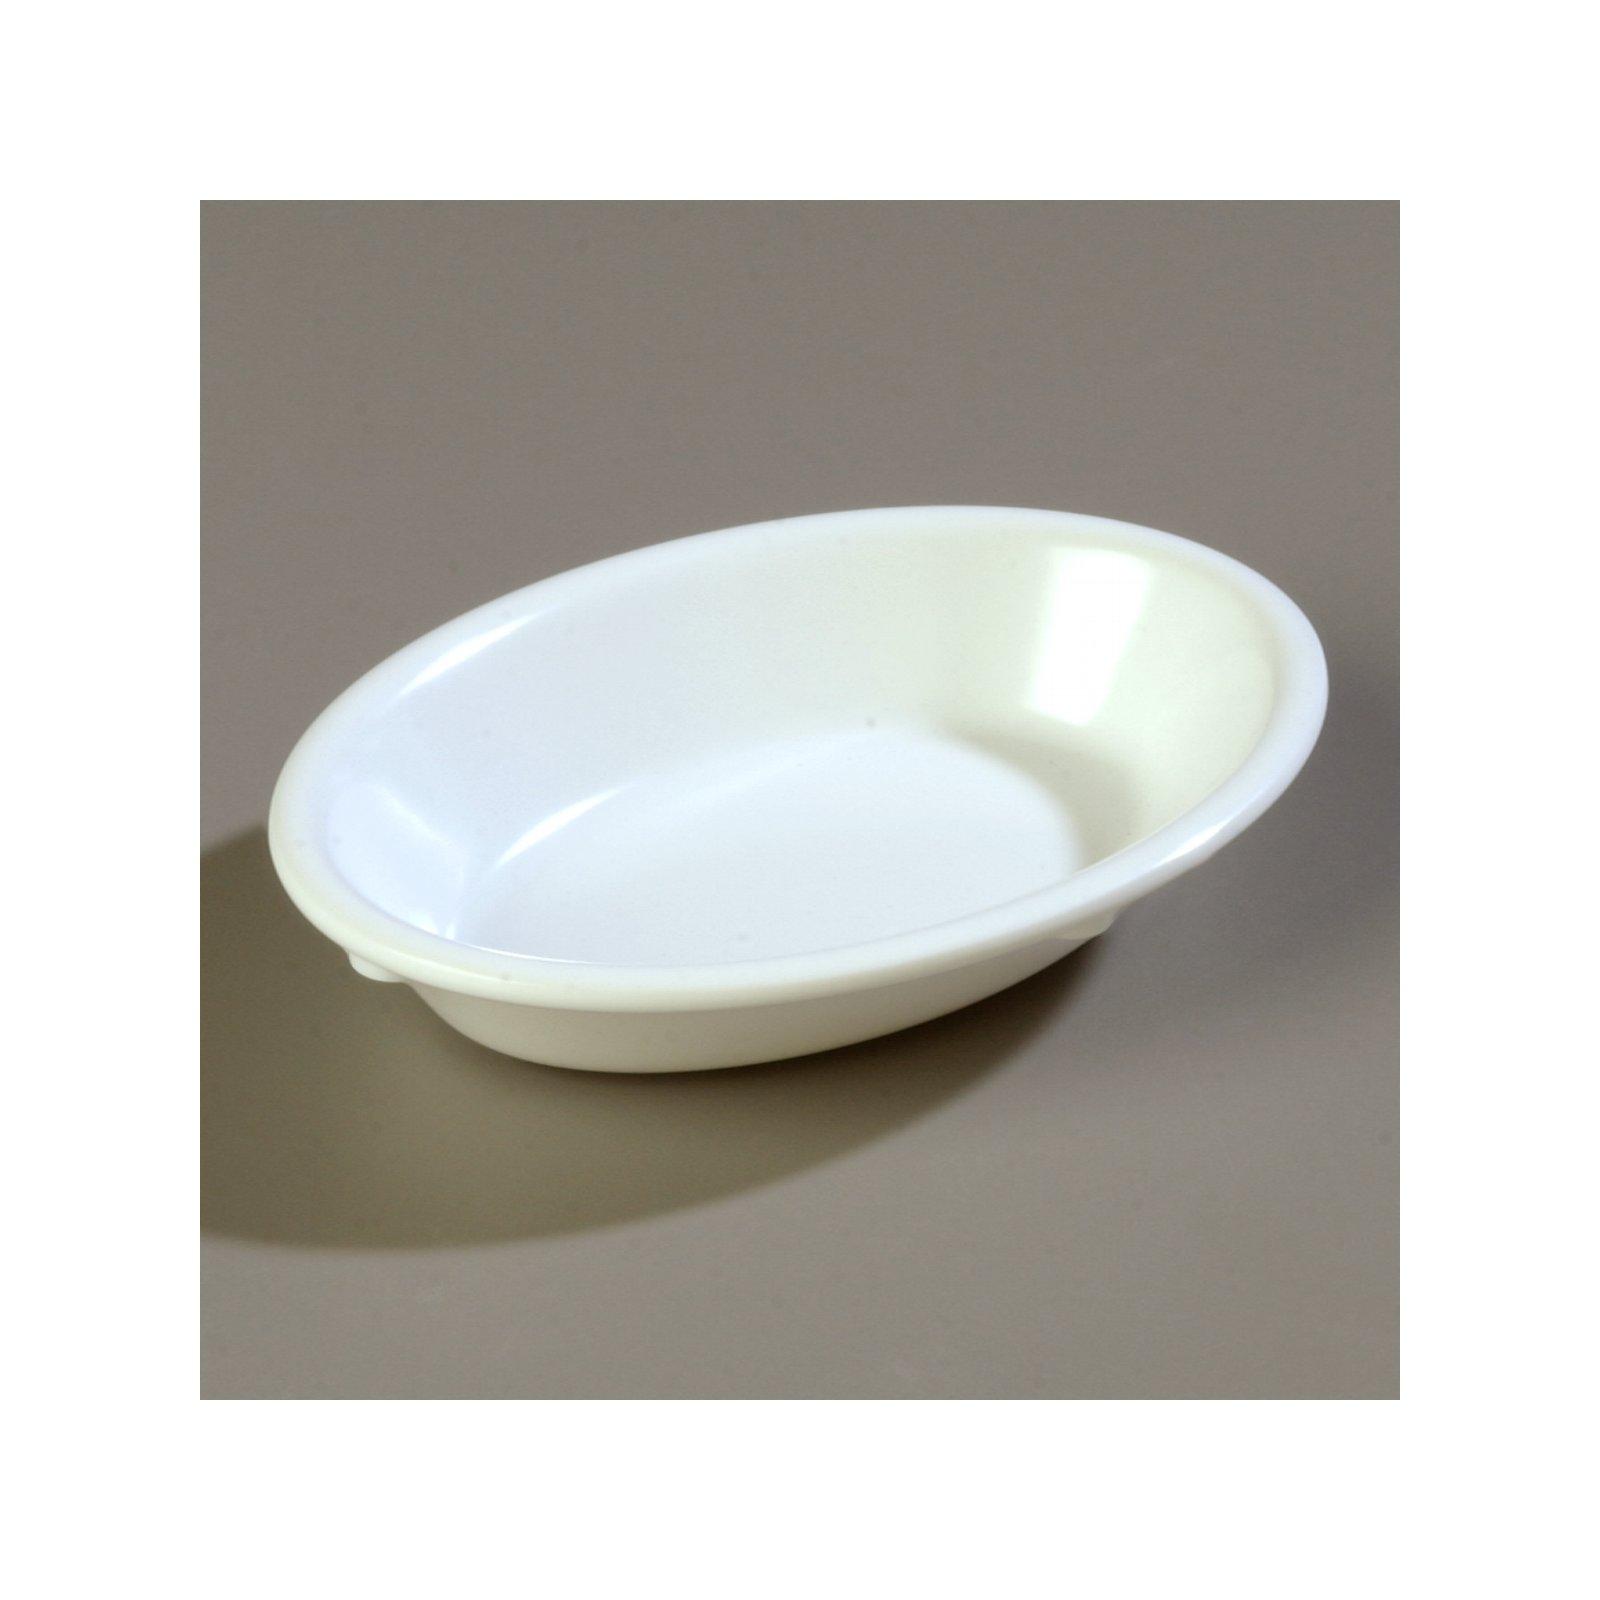 4353302 Dallas Ware Melamine Oval Fruit Bowl 6 5oz White Carlisle Foodservice Products